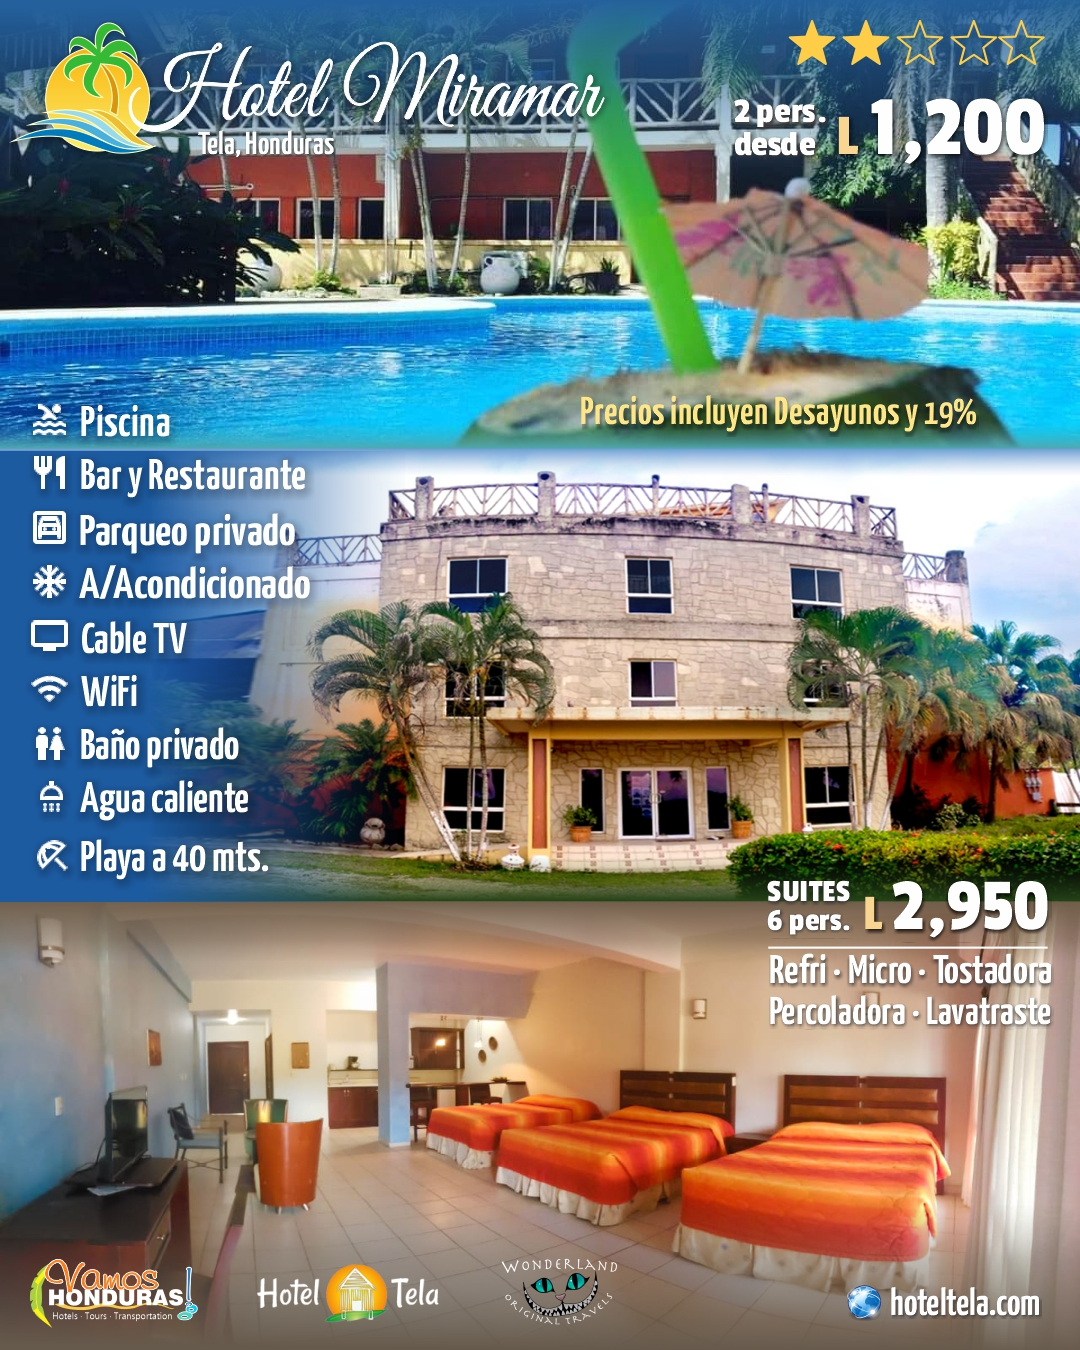 Hotel Miramar, Tela, Honduras